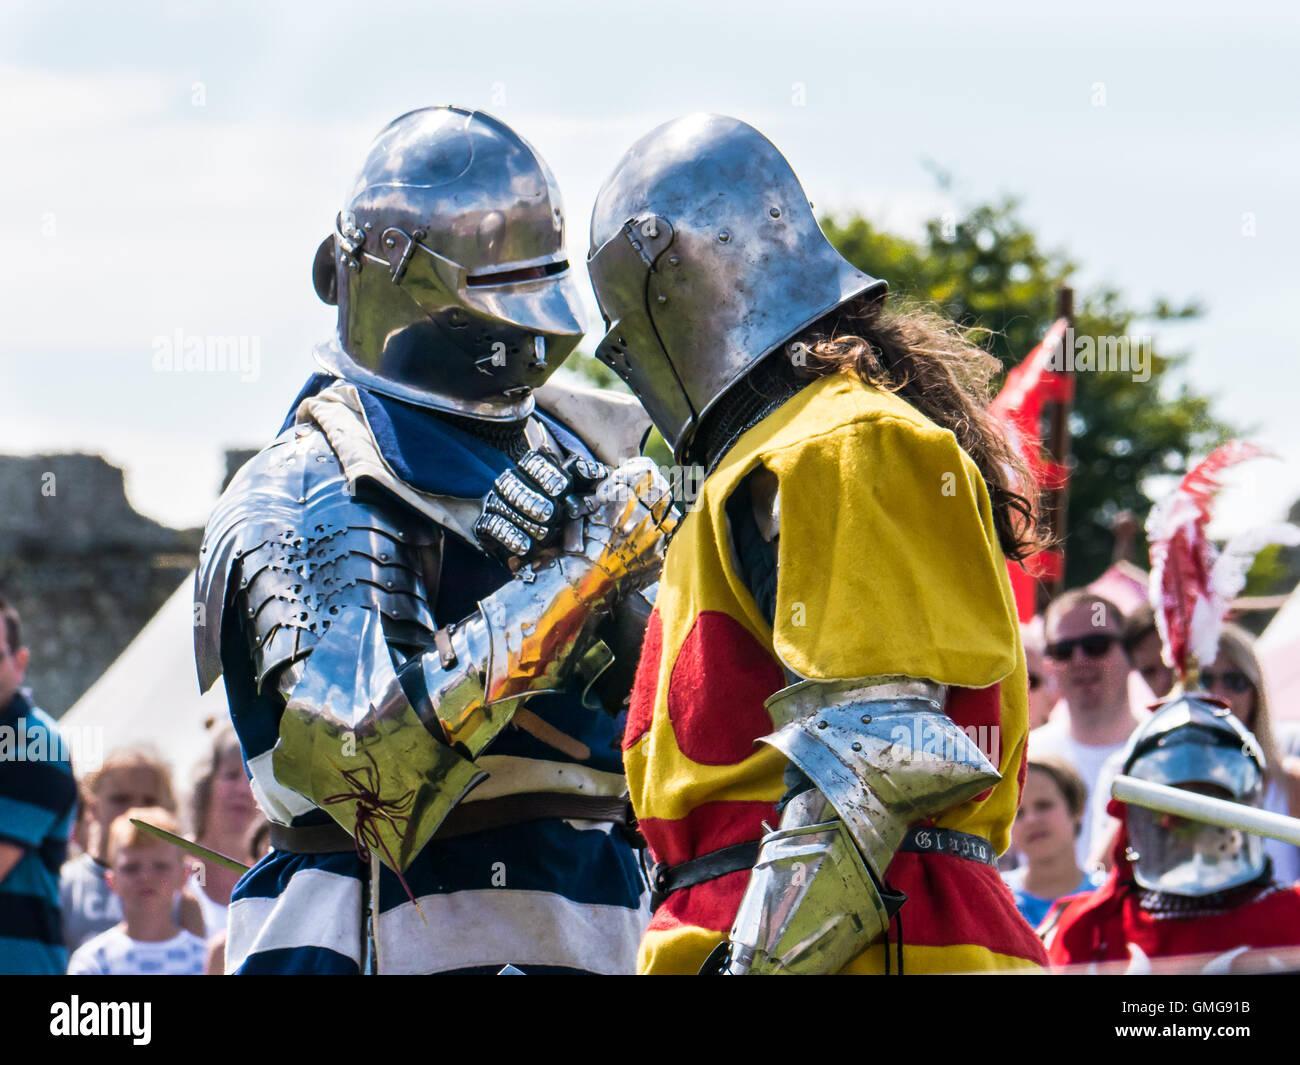 two-medieval-combat-reenactors-in-full-armour-shake-hands-prior-to-GMG91B.jpg